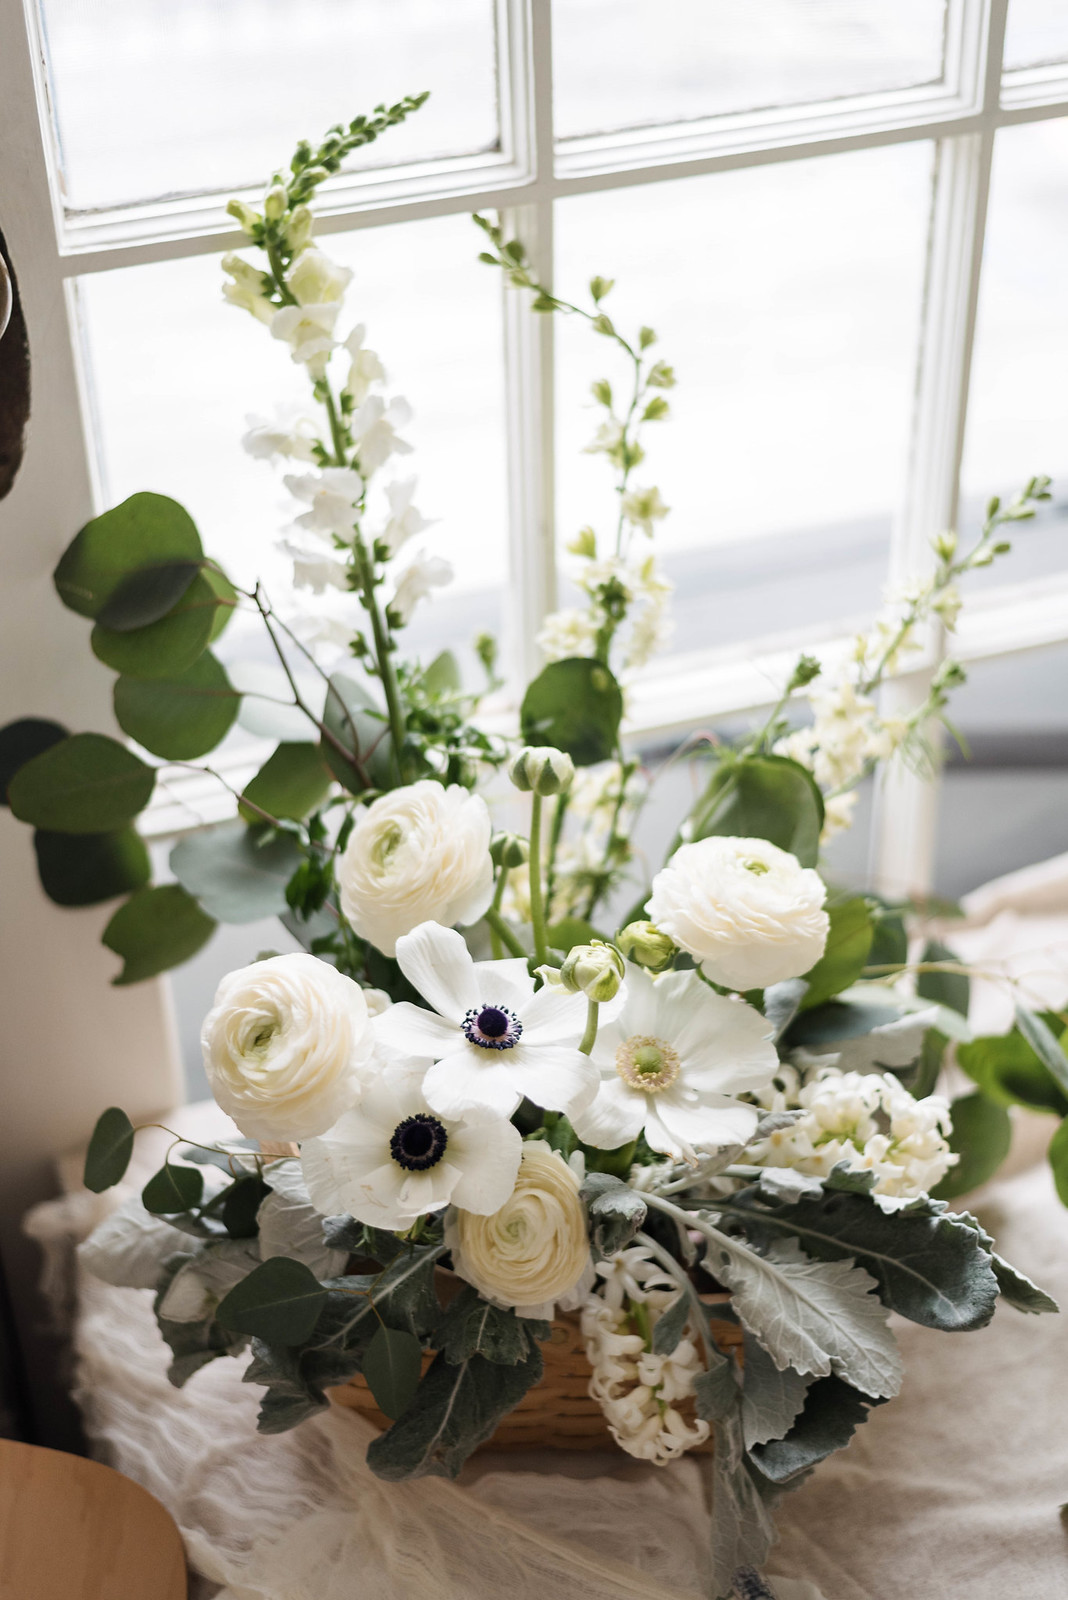 Floral Bouquets in Picnic Baskets on http://juliettelaura.blogspot.com/